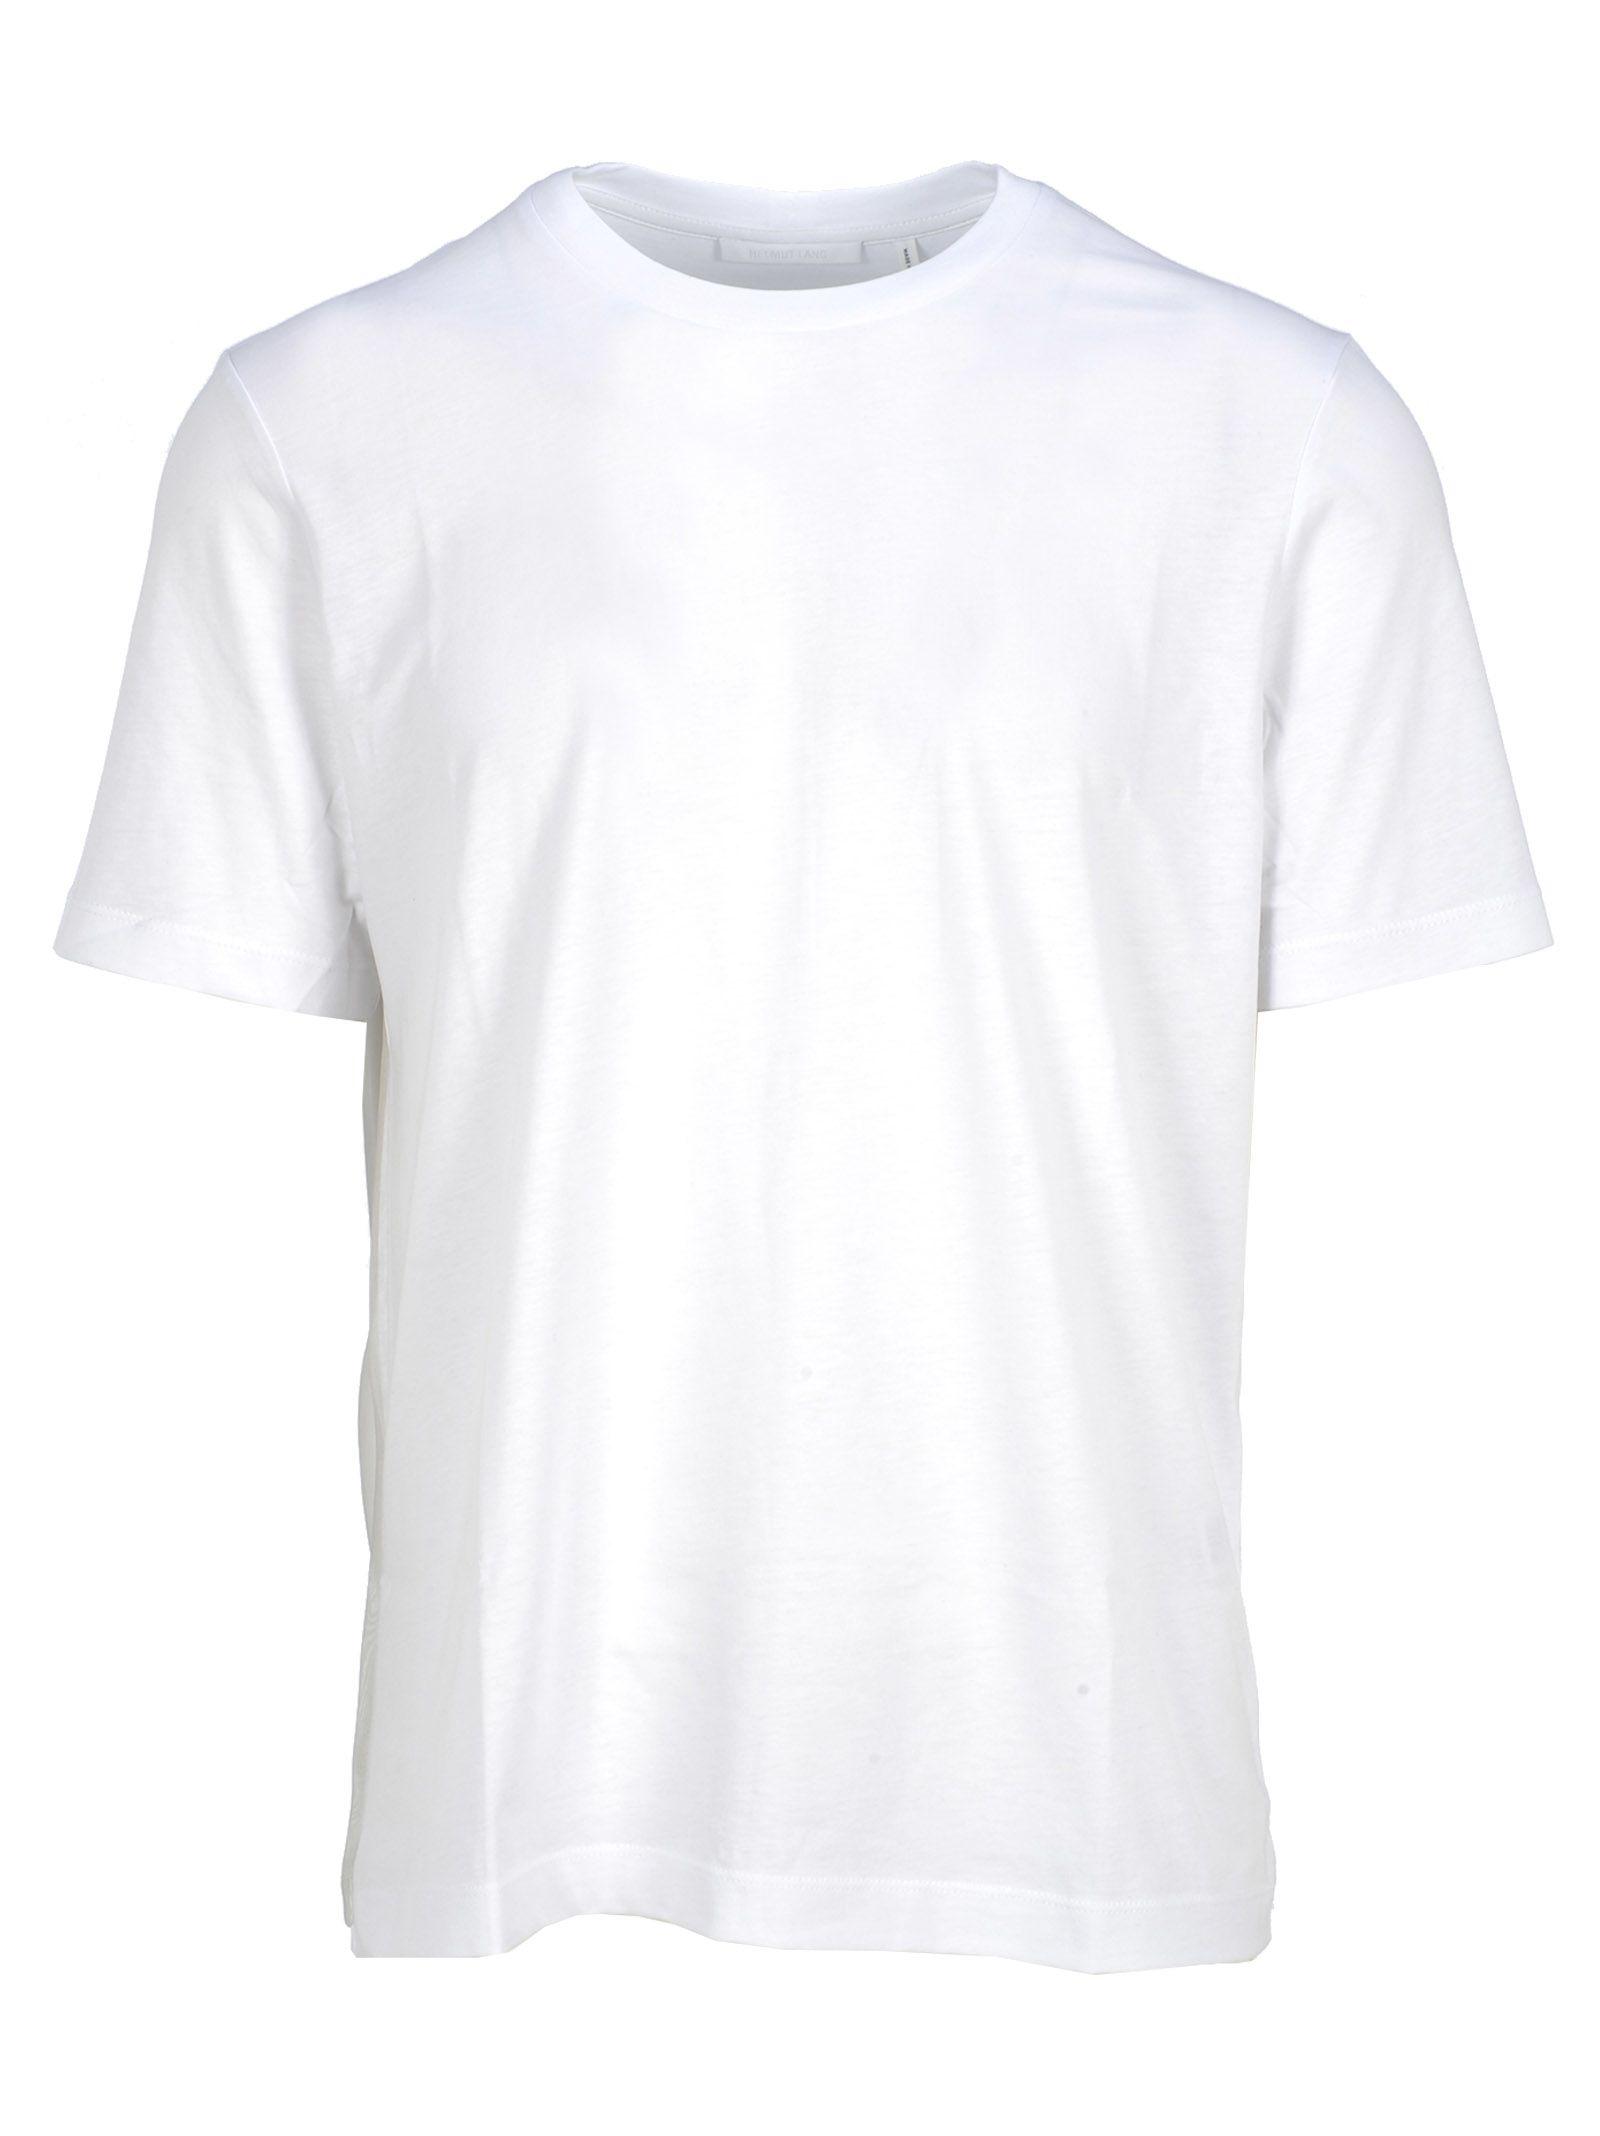 Helmut Lang Tshirt Manica Corta